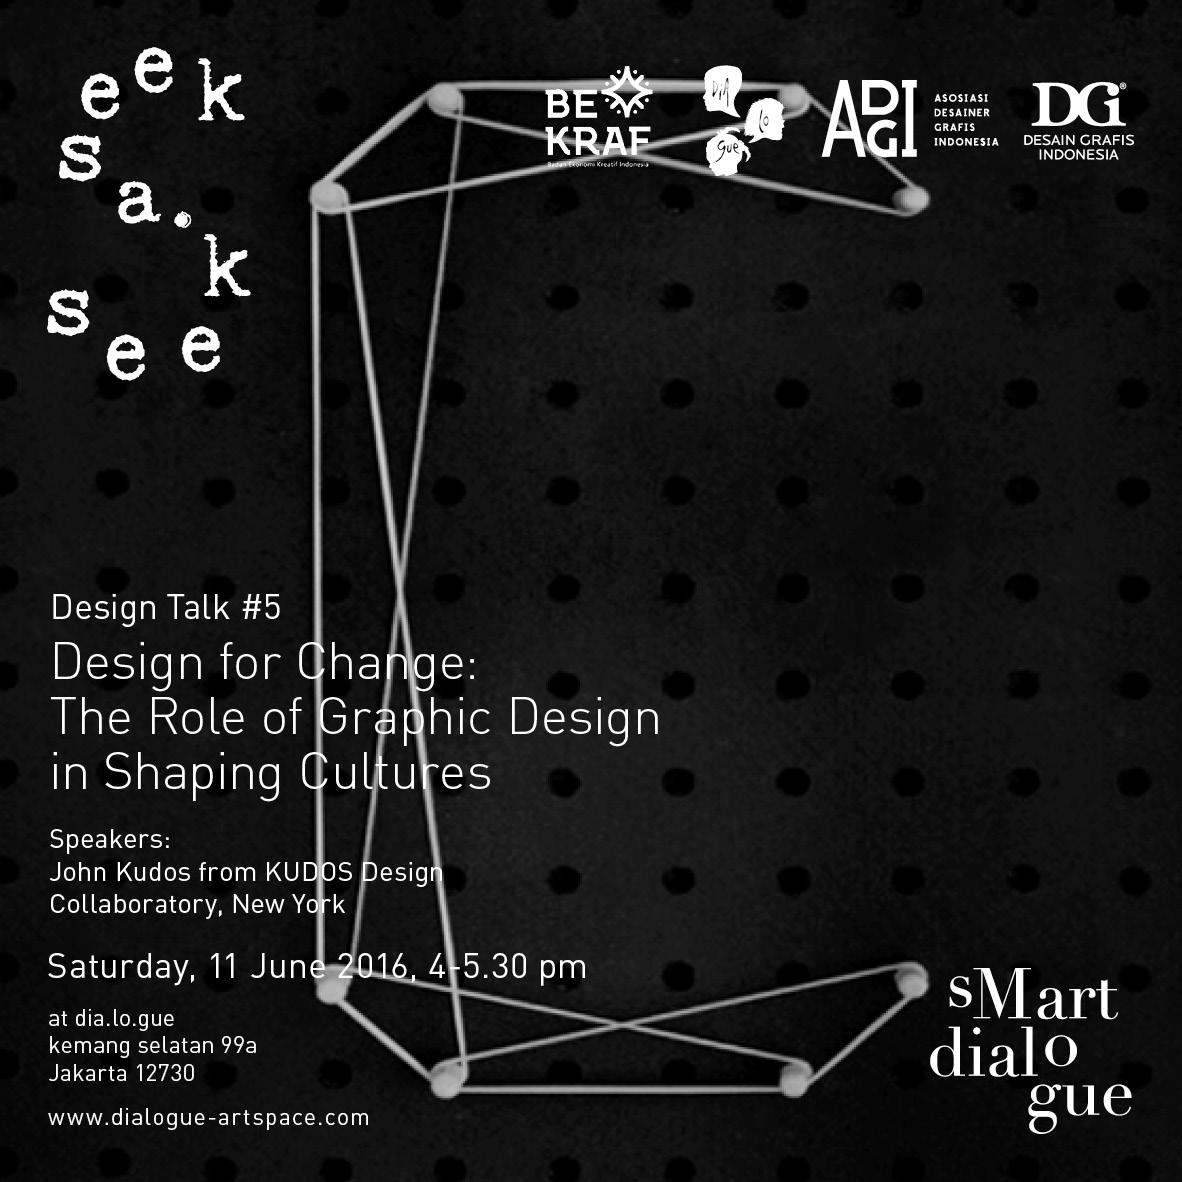 Seek-A-Seek-DesignTalk5-IG